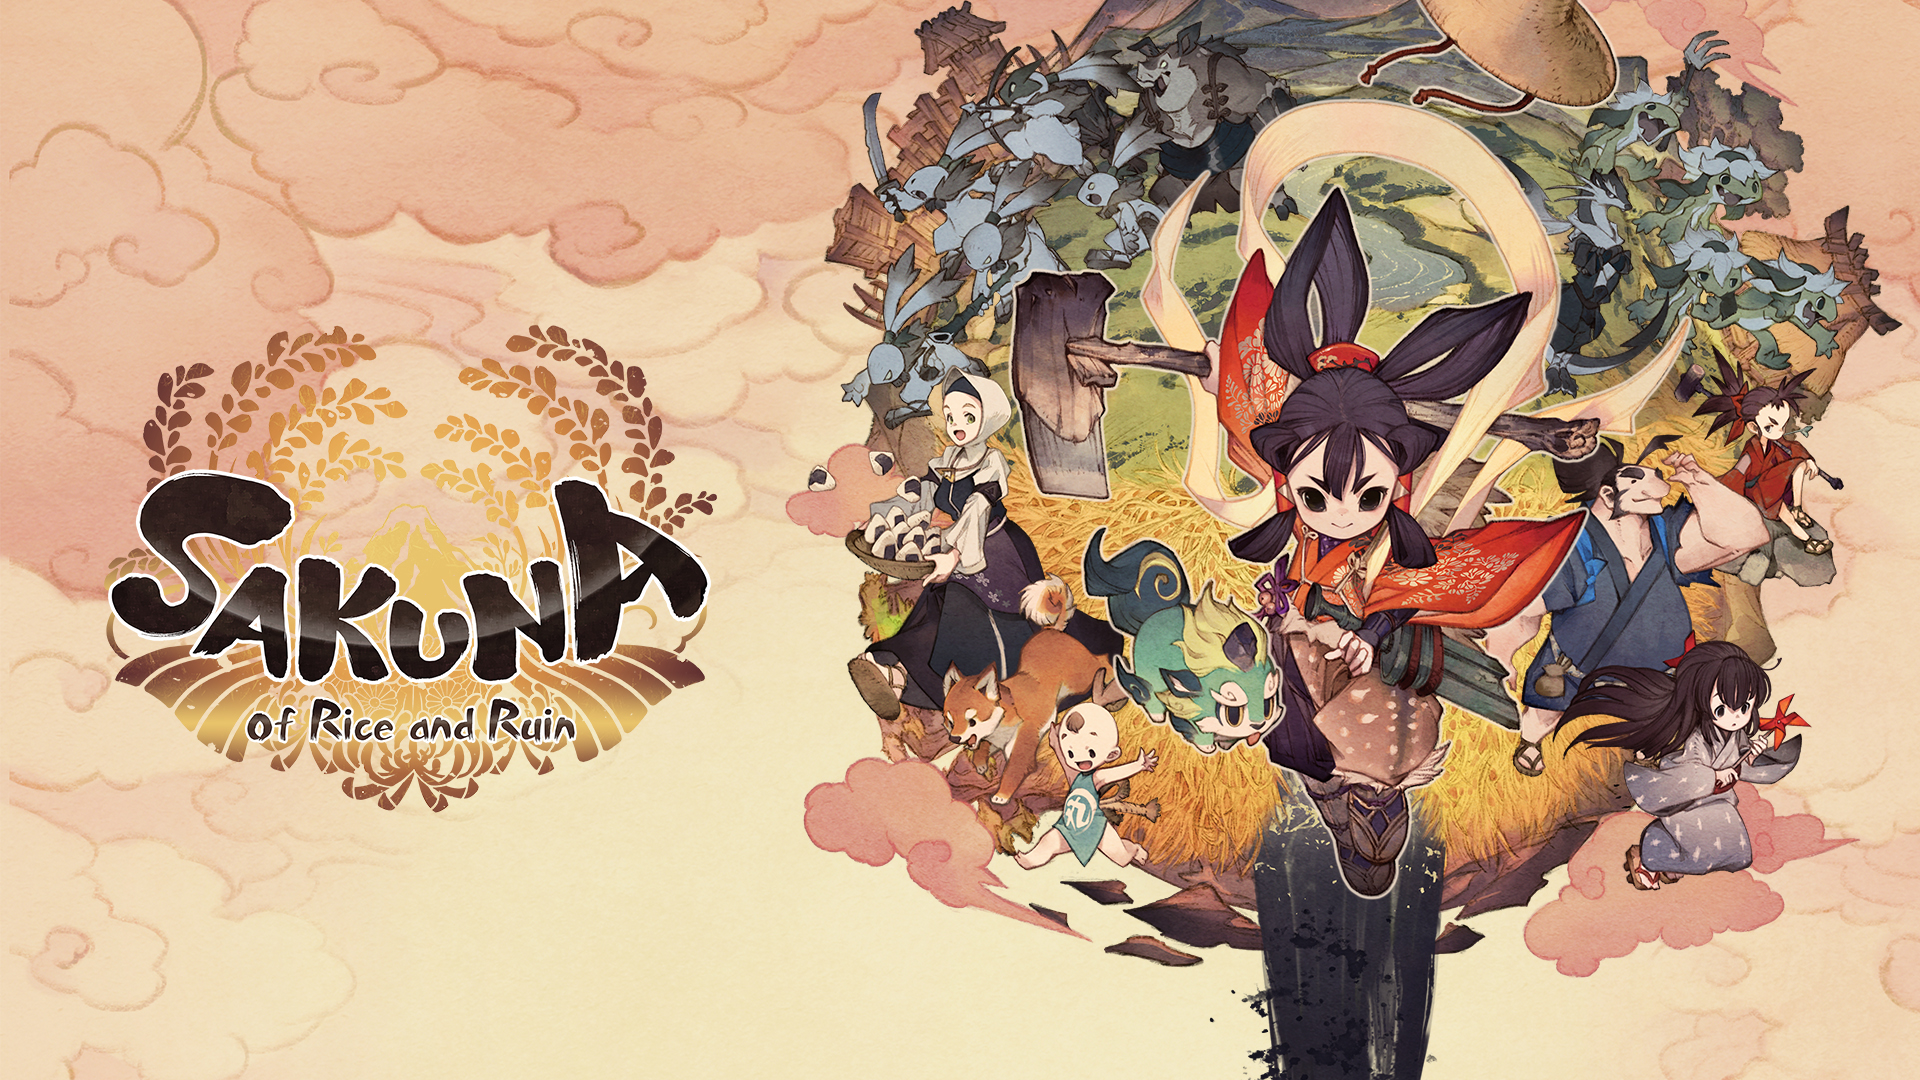 sakuna-of-rice-and-ruin-switch-hero-nintendon